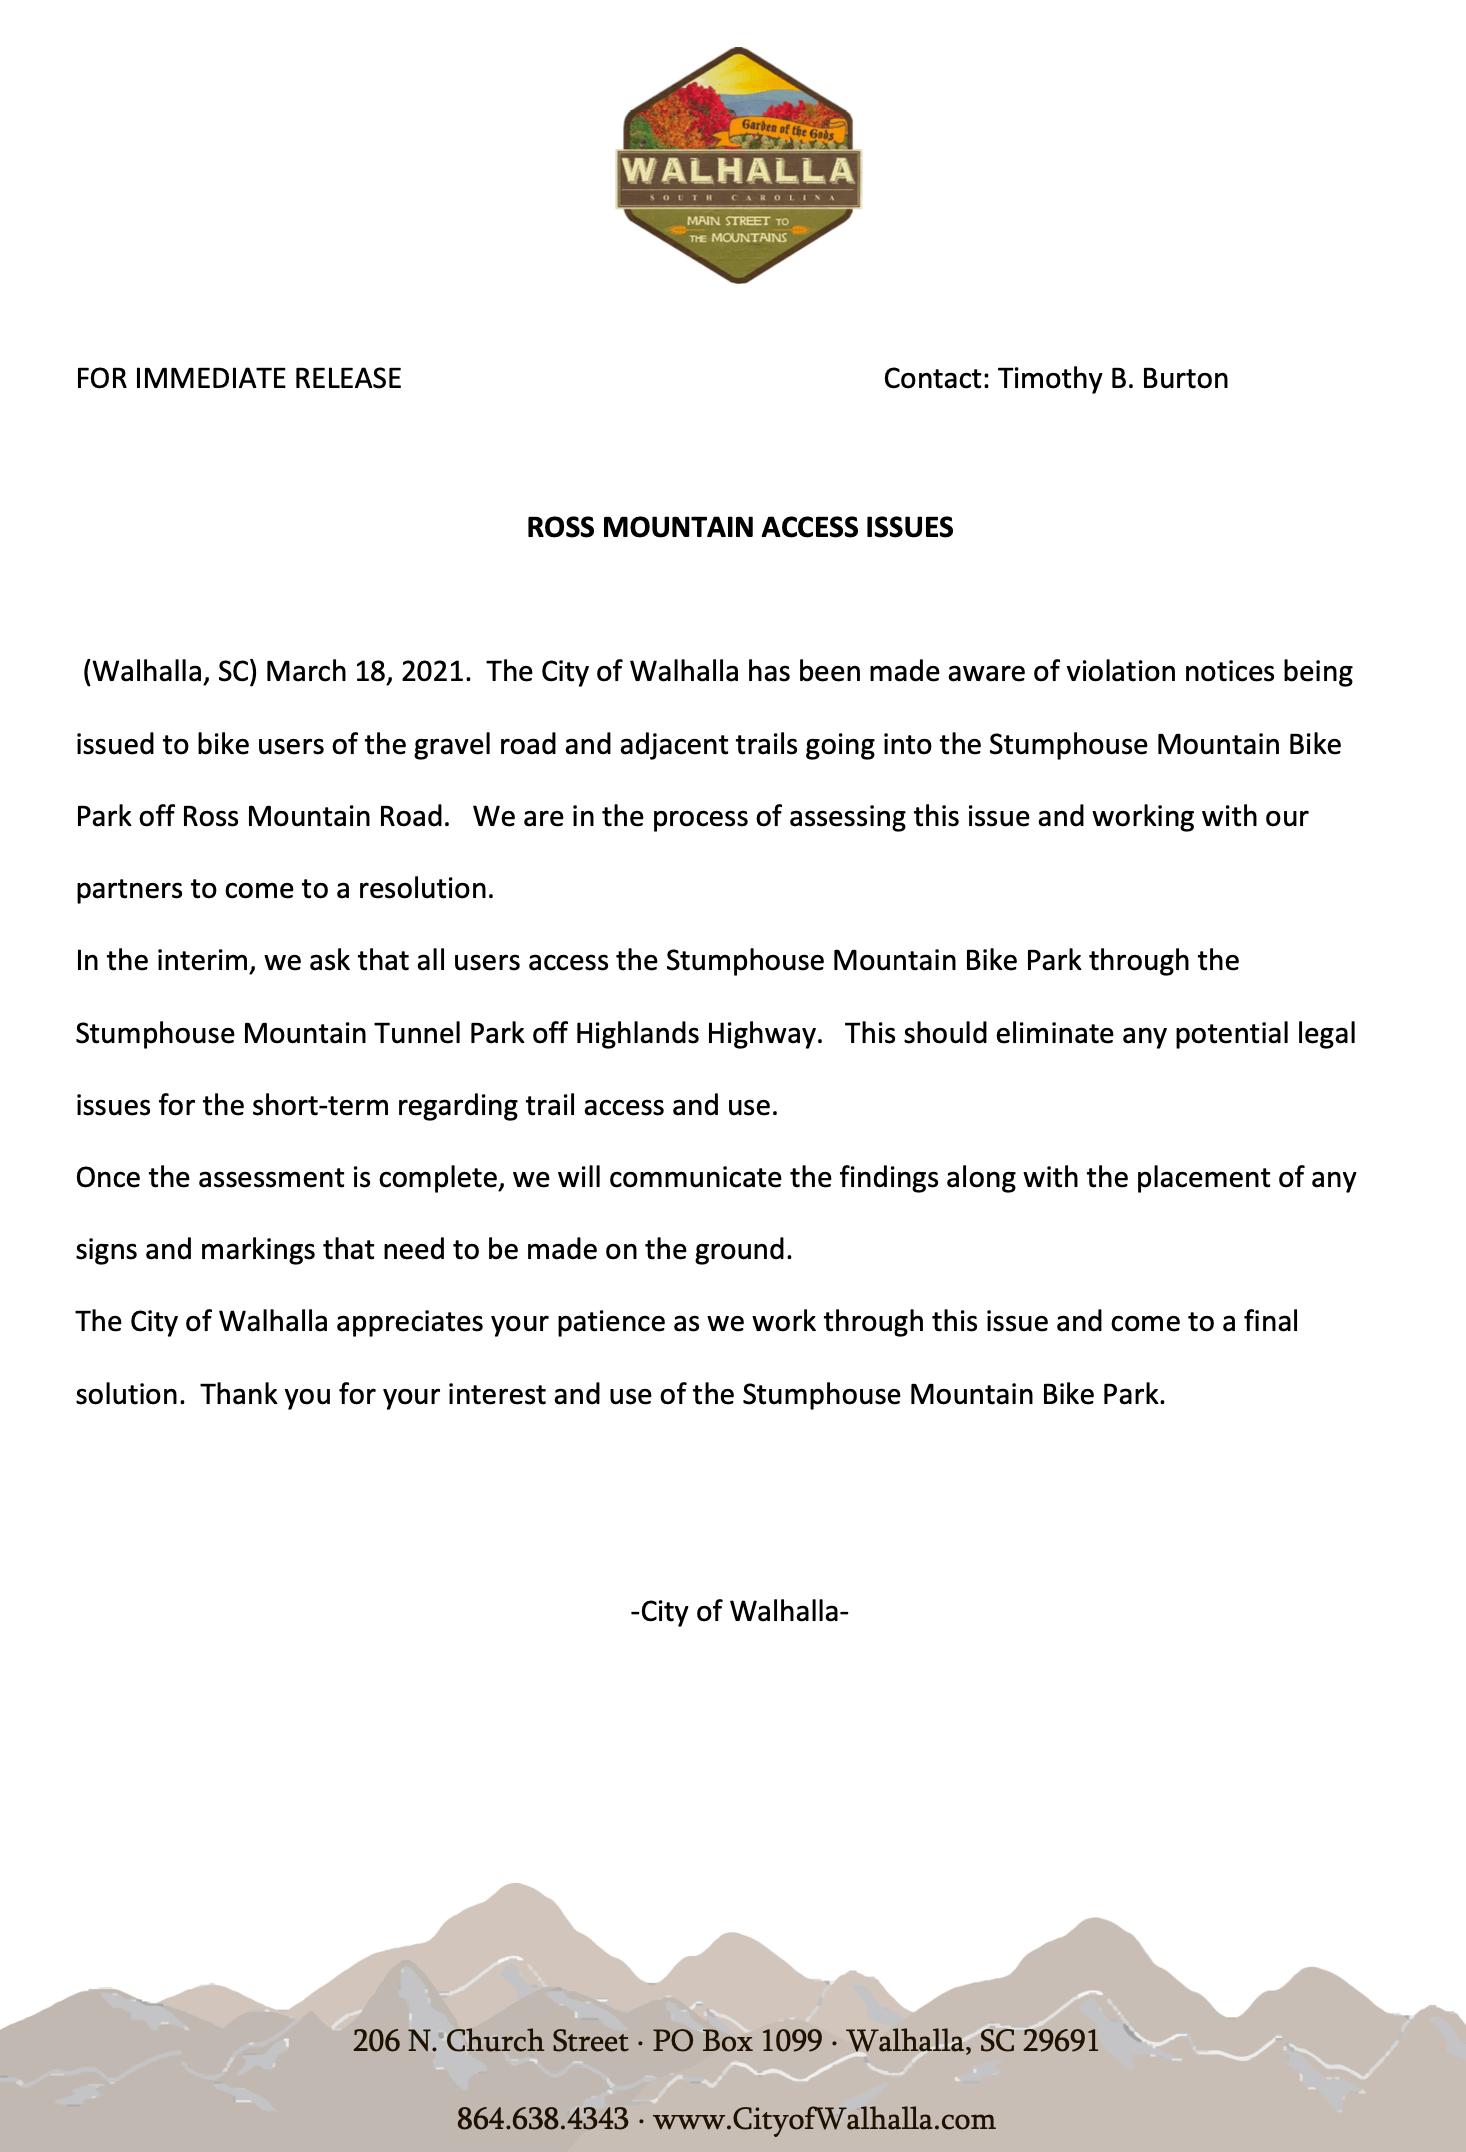 letter regarding Ross Mtn Access